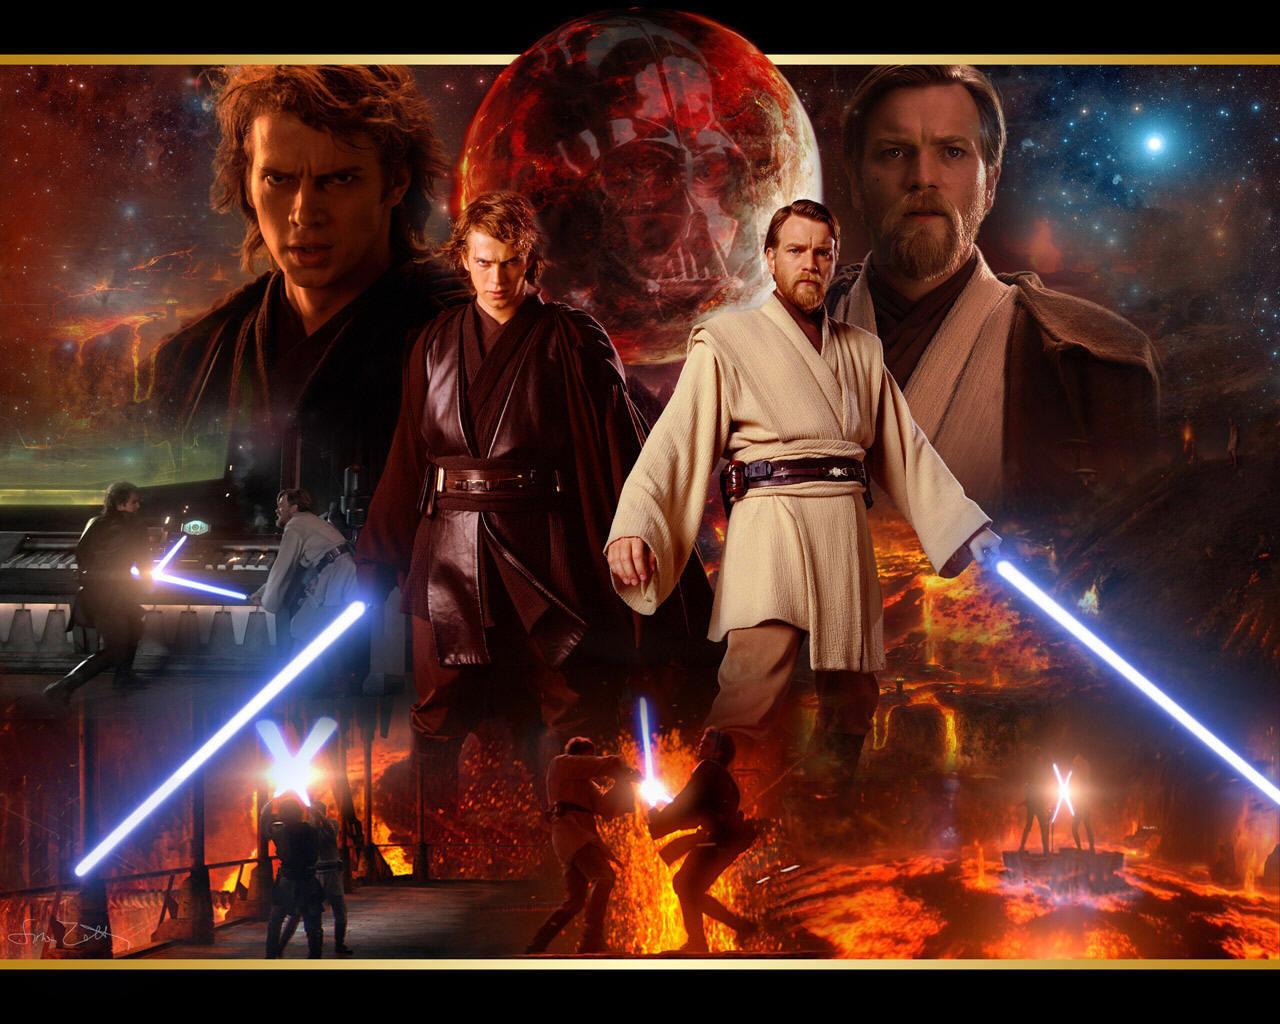 Obi Wan and Anakin   obi wan kenobi and Anakin skywalker Wallpaper 1280x1024